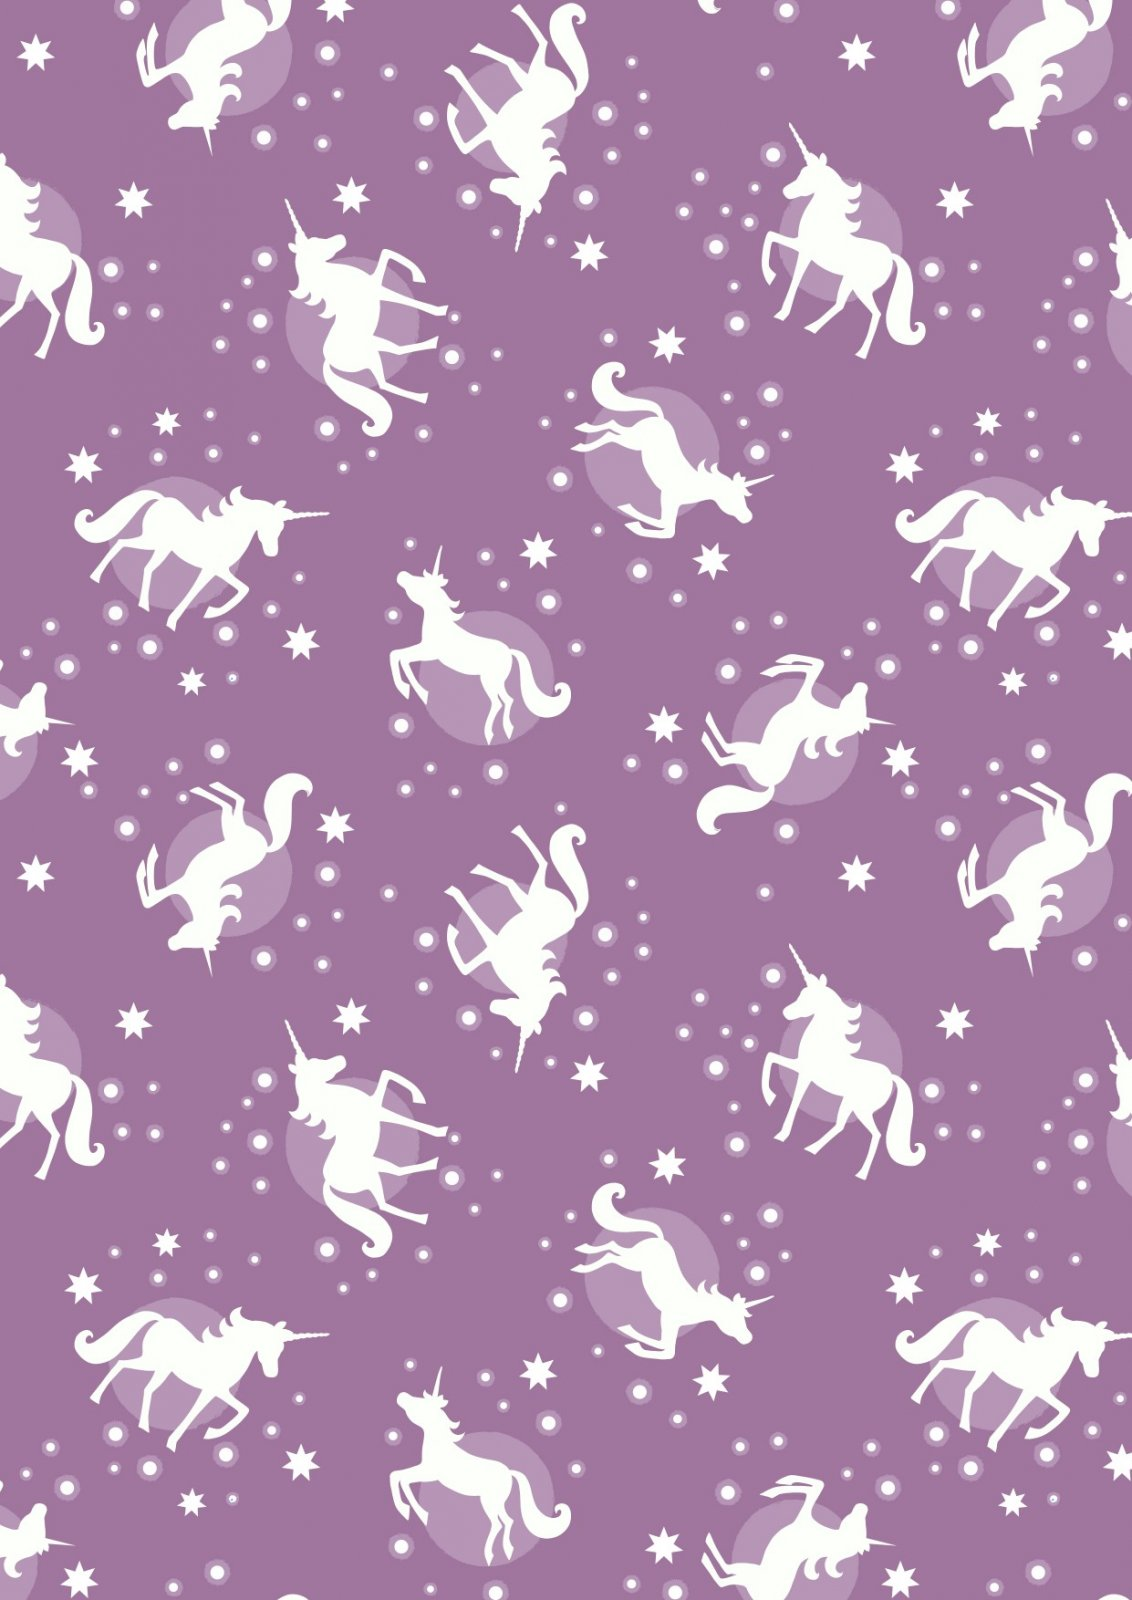 Fairy Nights - Unicorn Spots - Blackberry